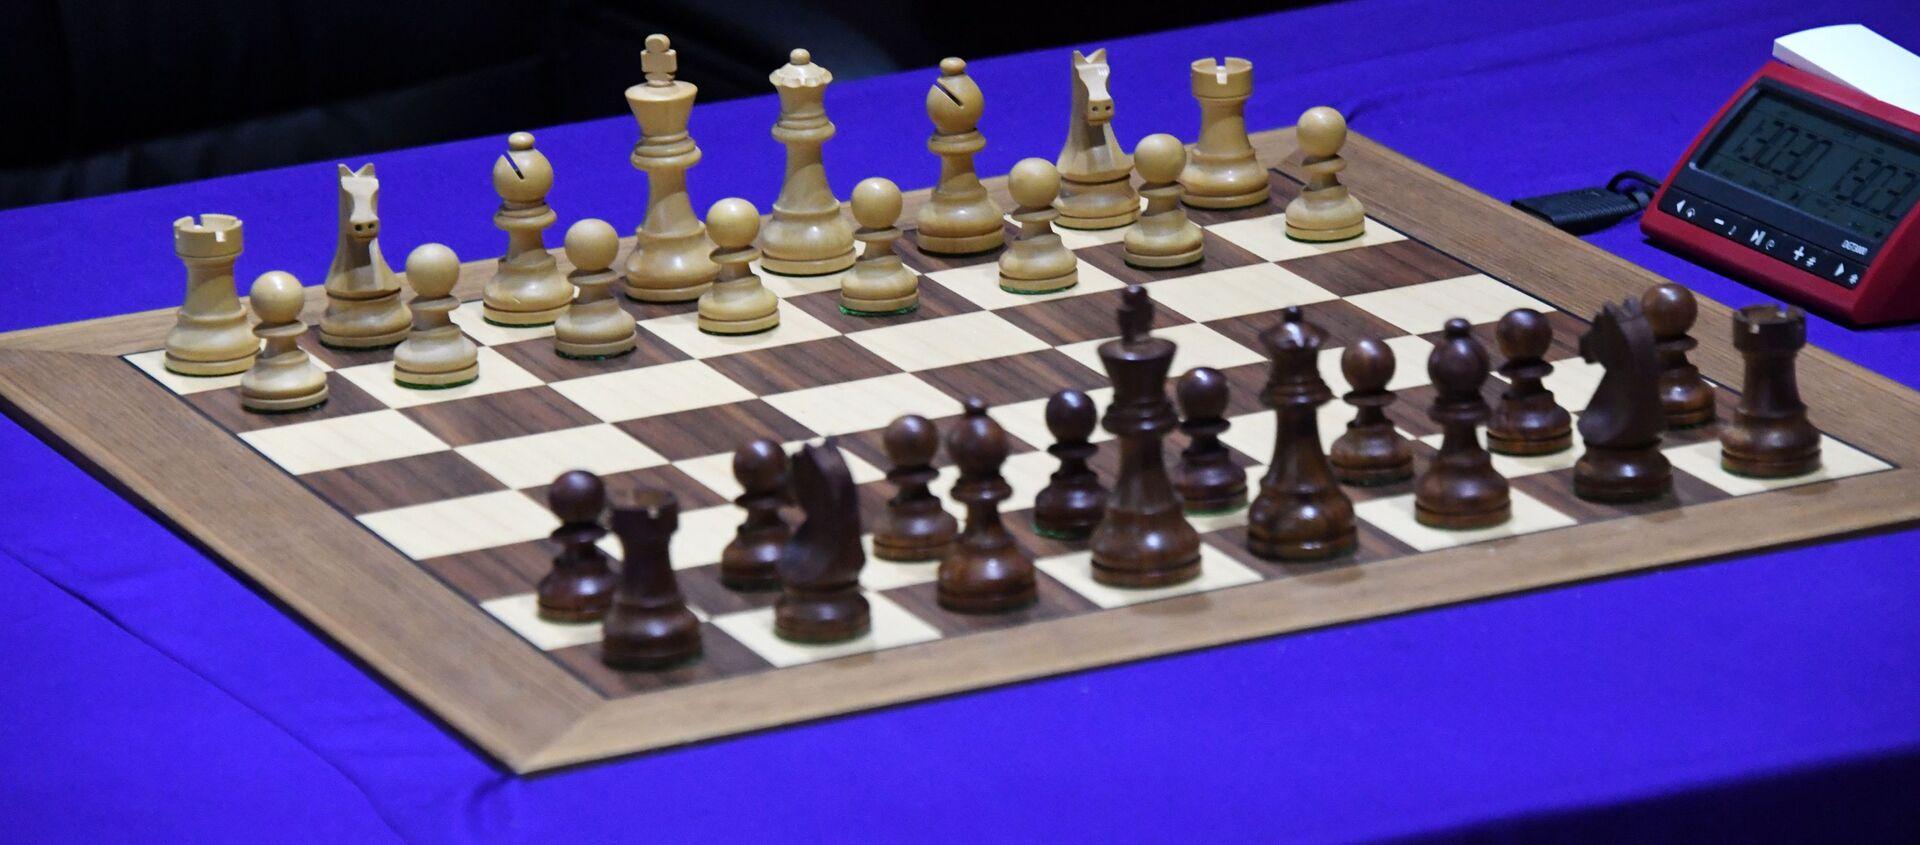 Шахматная доска с фигурами на шахматном турнире - Sputnik Беларусь, 1920, 06.10.2020